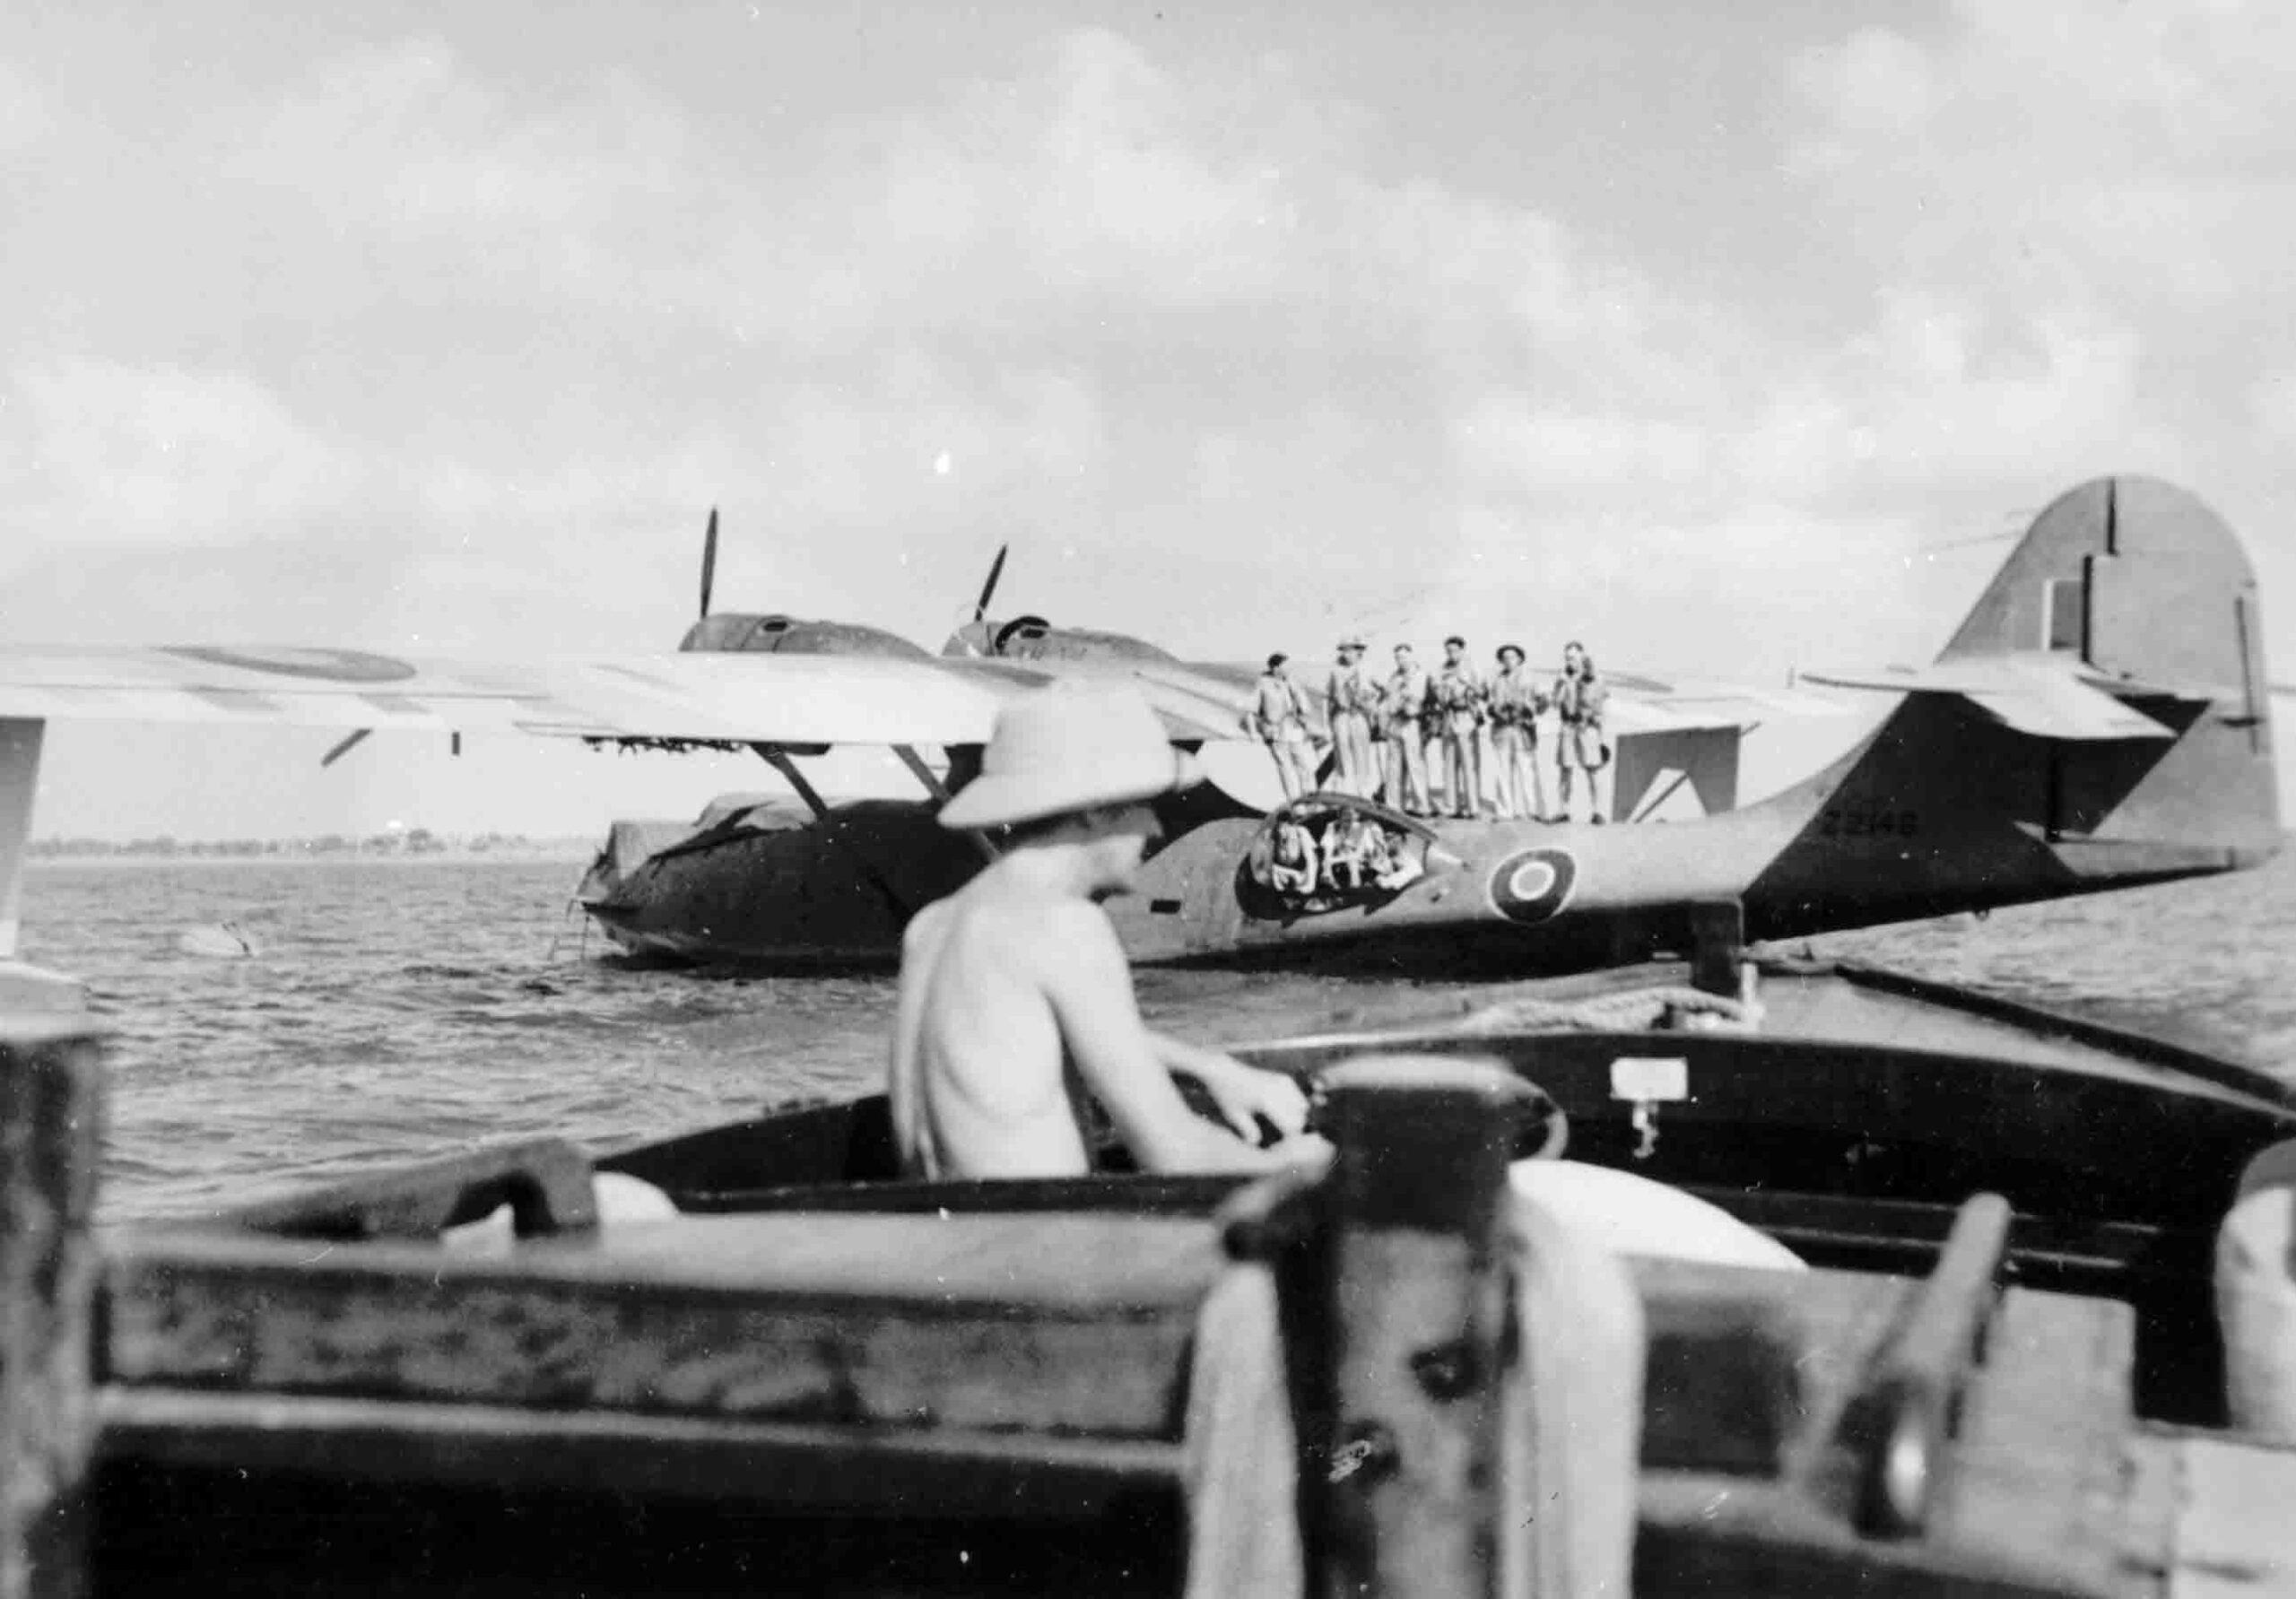 Consolidated Catalina Mk. I of 240 Squadron, Redhills Lake, Ceylon, 1944 (RAFM P002435)